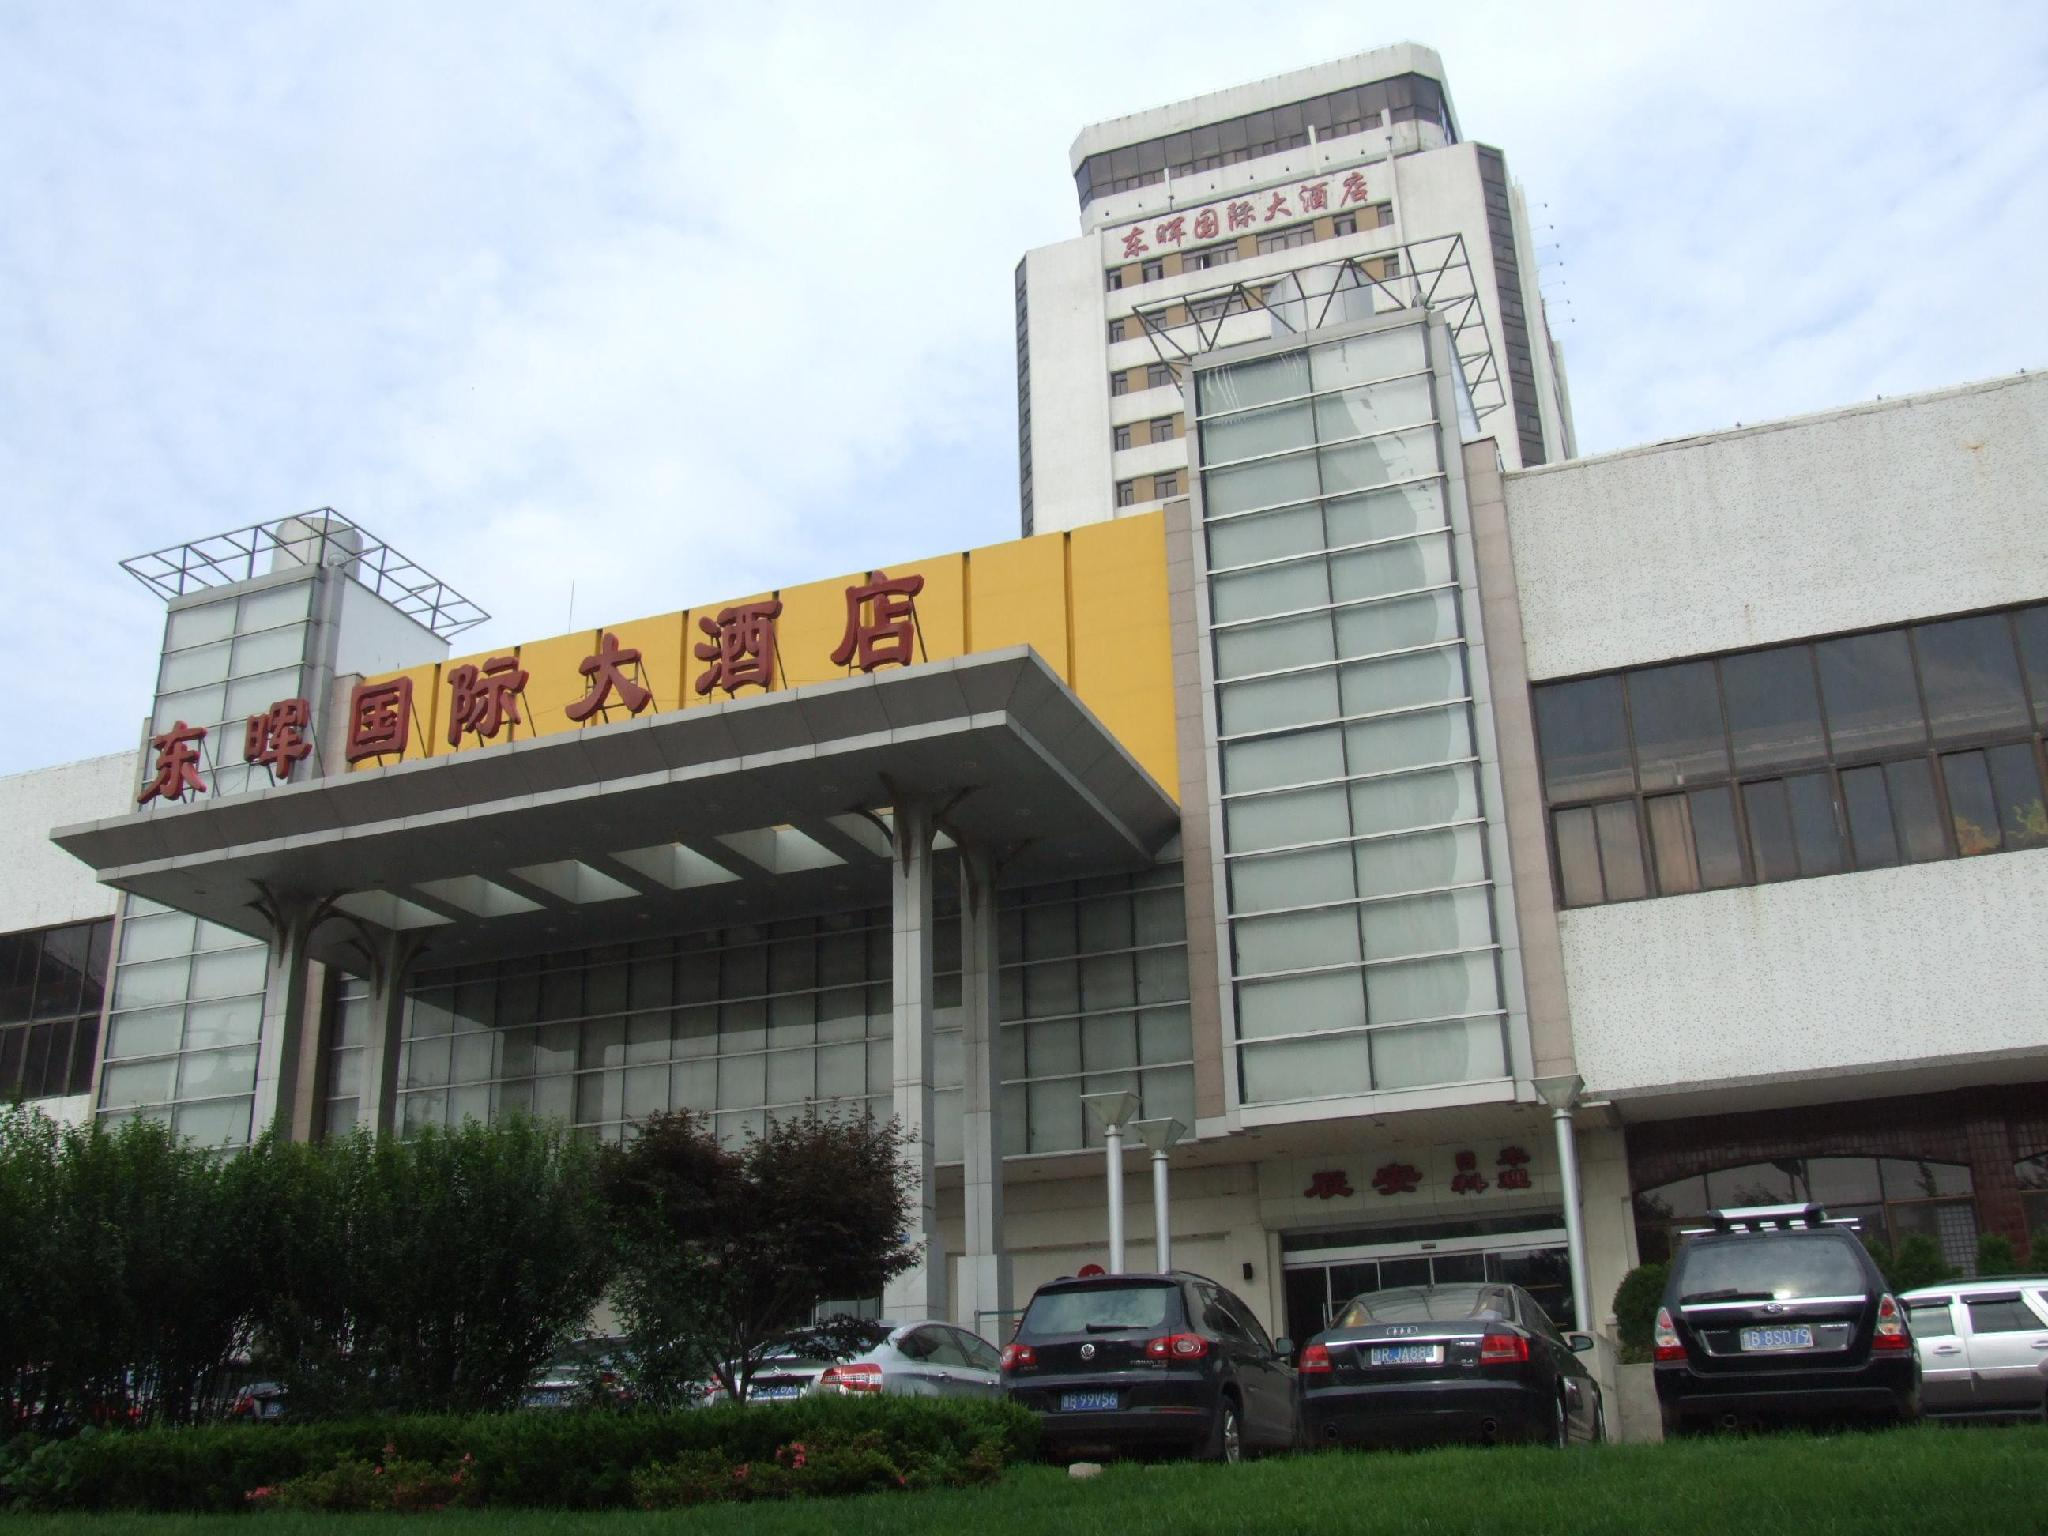 Qingdao Eastern Light International Hotel